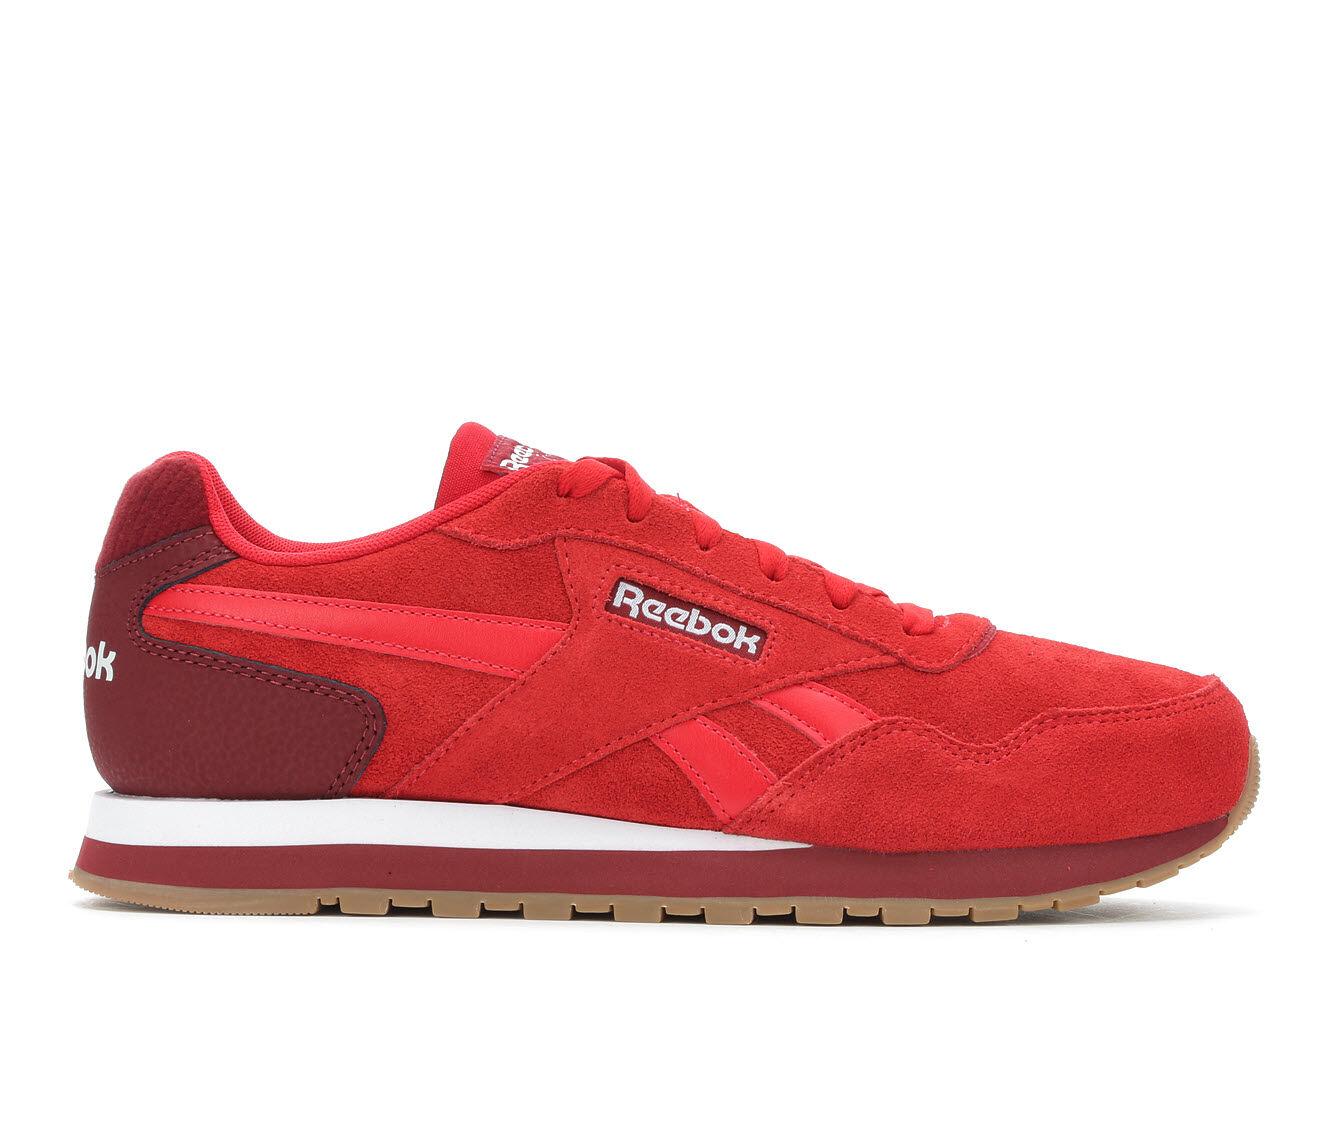 Men's Reebok Harman Retro Sneakers Red/Burg/White